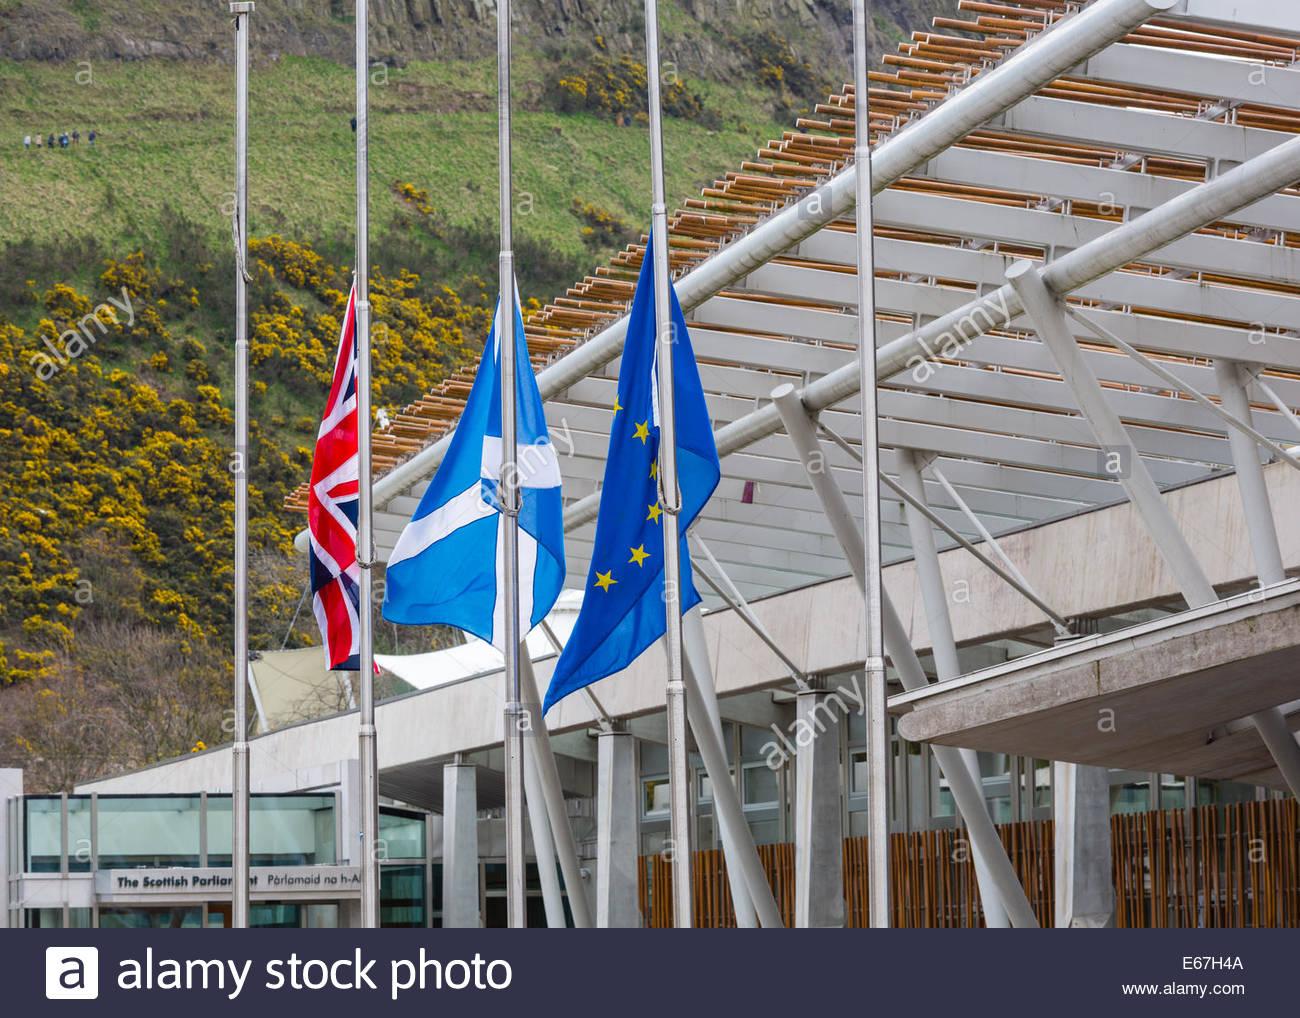 UK, Scotland and EU flags - Stock Image